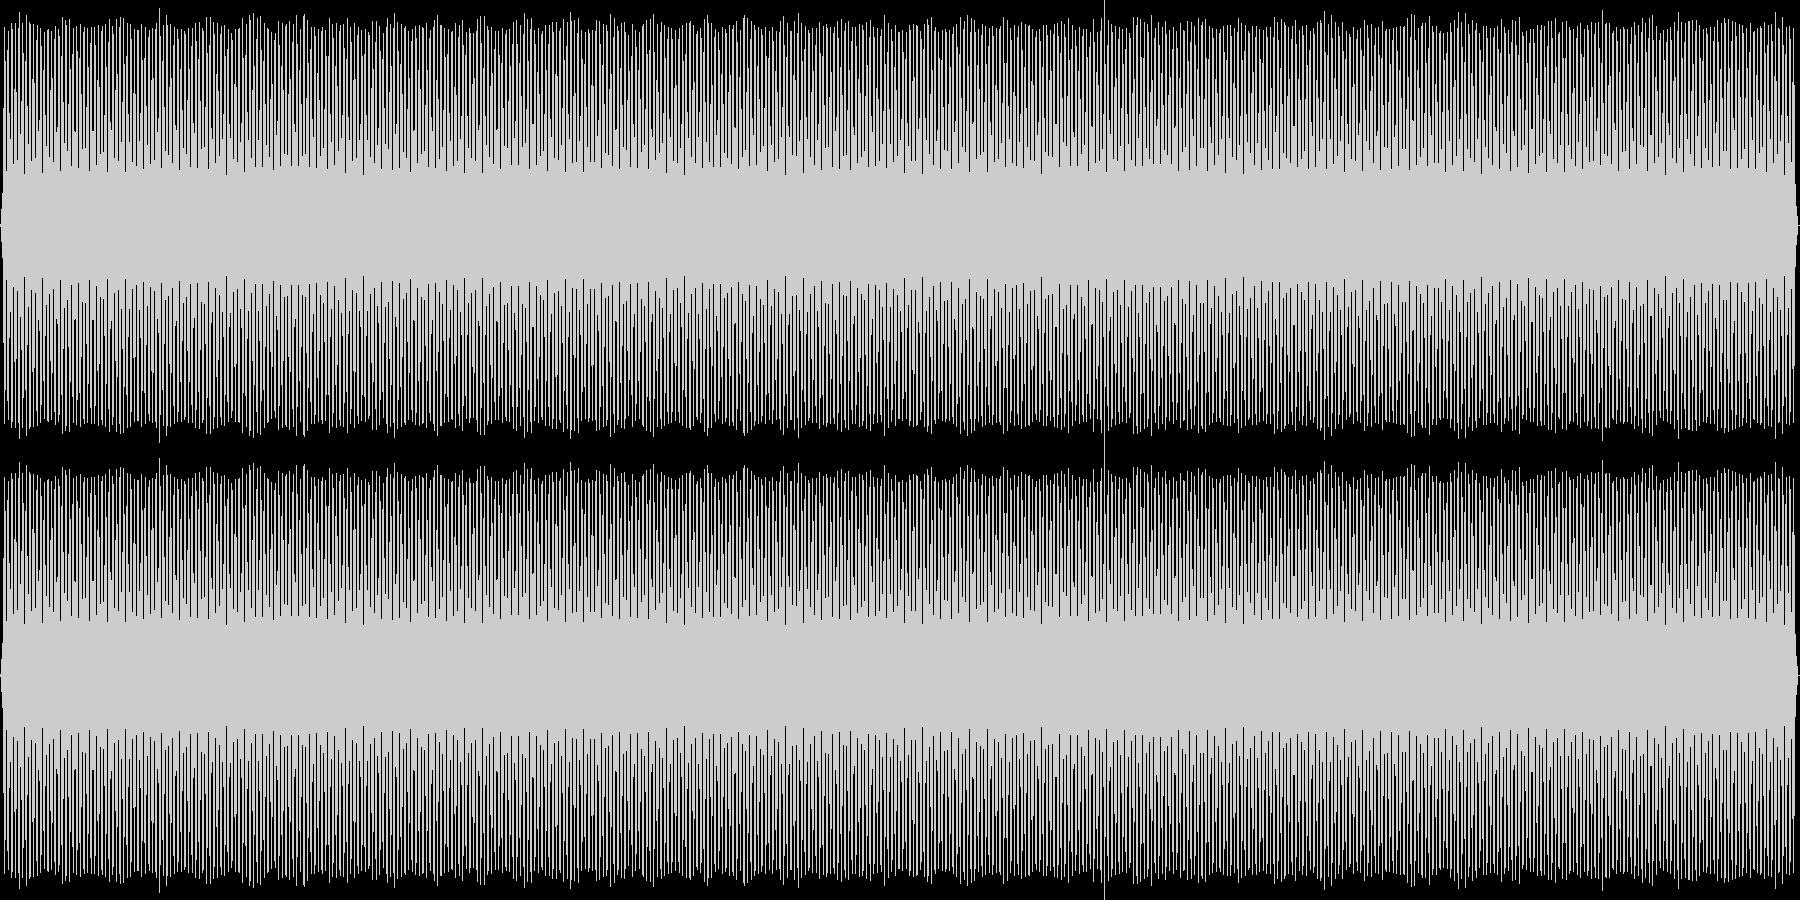 SFチックな背景音(レトロゲーム風)の未再生の波形